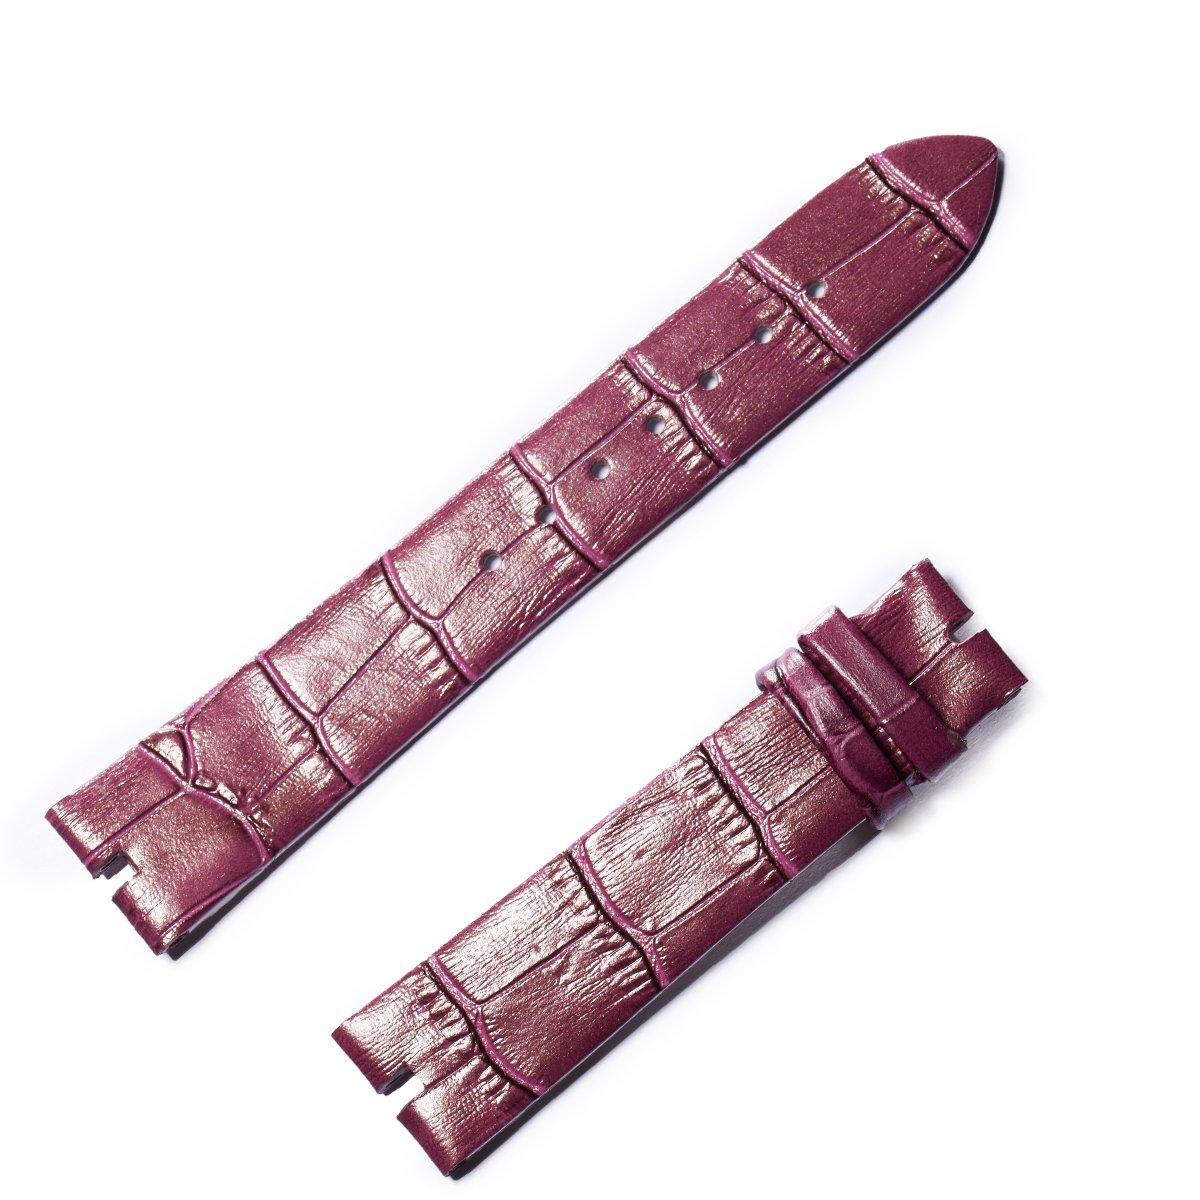 Reef Tiger/RT Womens Watch Genuine Leather Strap with Buckle Waterproof Purple Strap RGA151